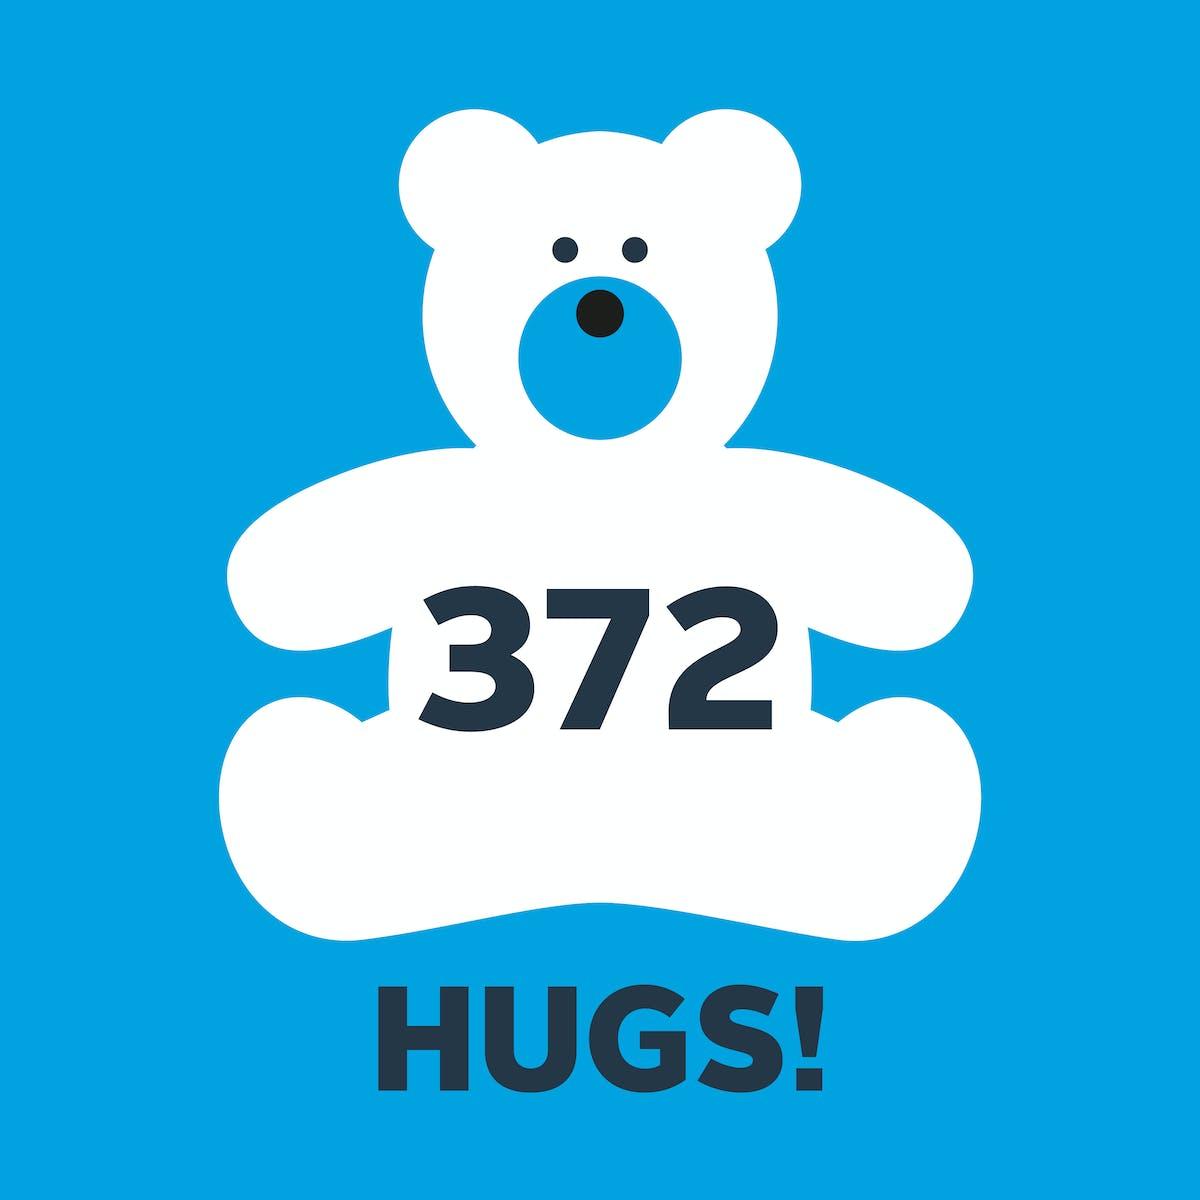 Orbis Flying Eye Hospital Jamaica: Graphic shows Seymour the Bear gave 372 hugs